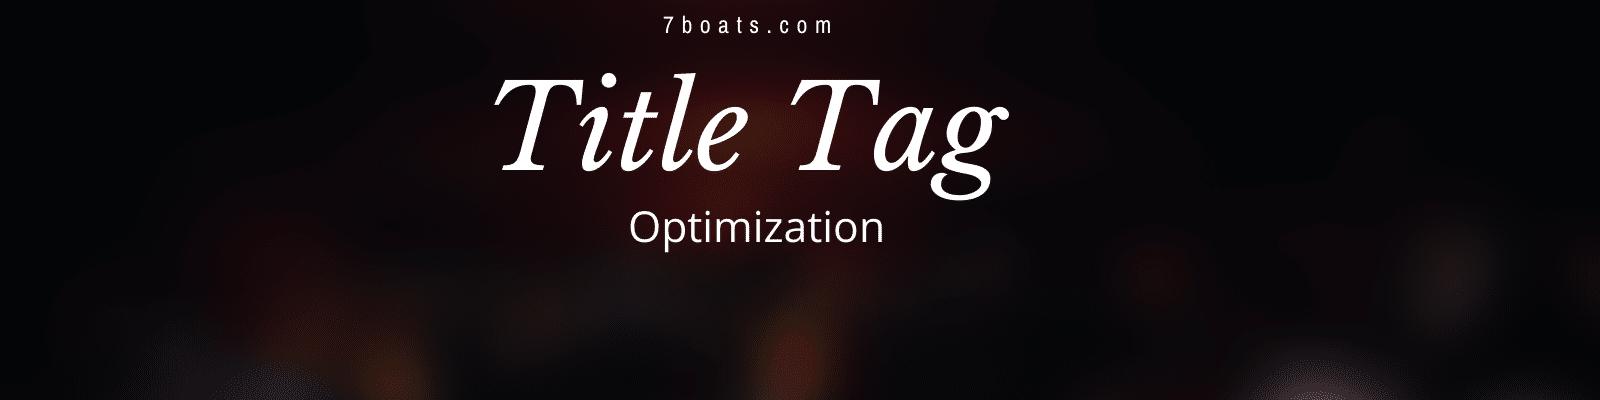 Title Tag Optimization -7boats